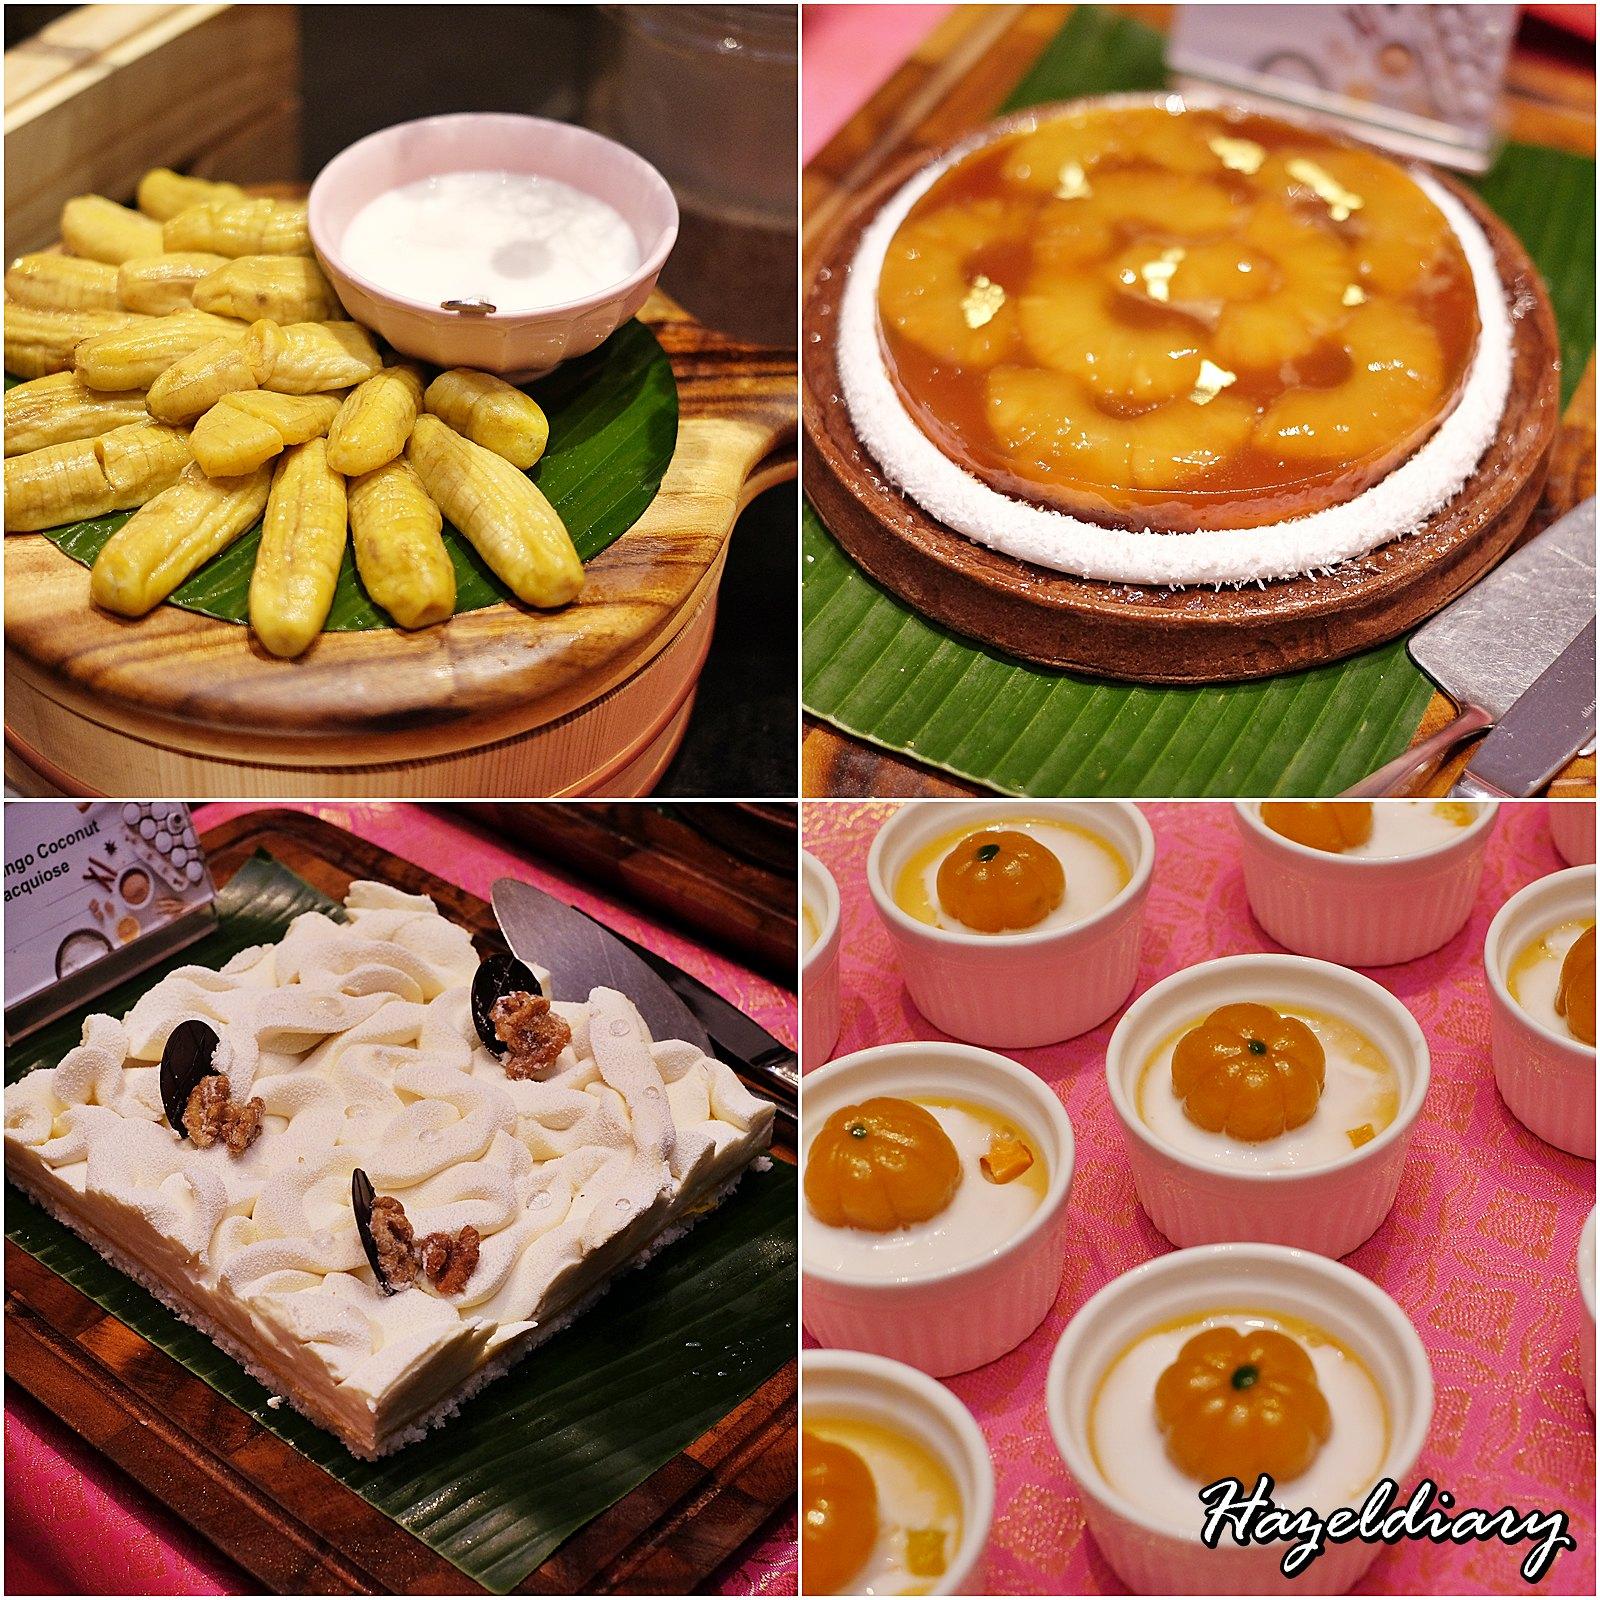 EnThaising Siam-The Dining Room Sheraton Towers Singapore-Dessert